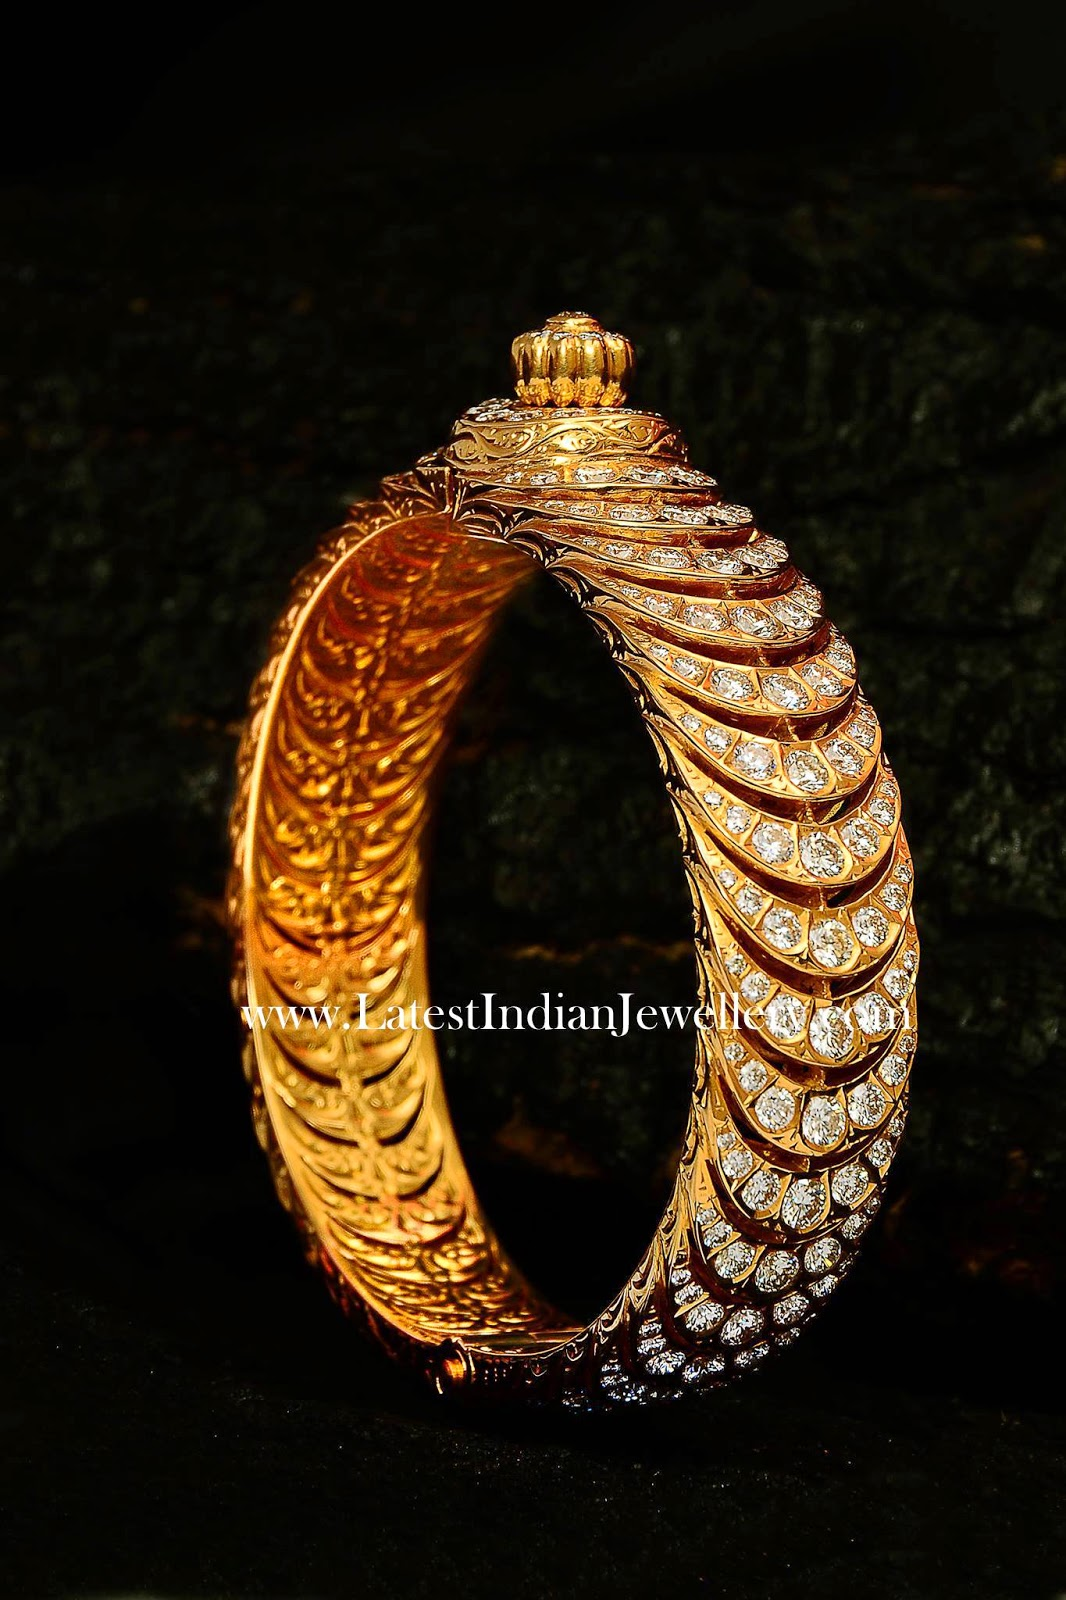 Spectacular Diamond Bangle Kada Latest Indian Jewellery